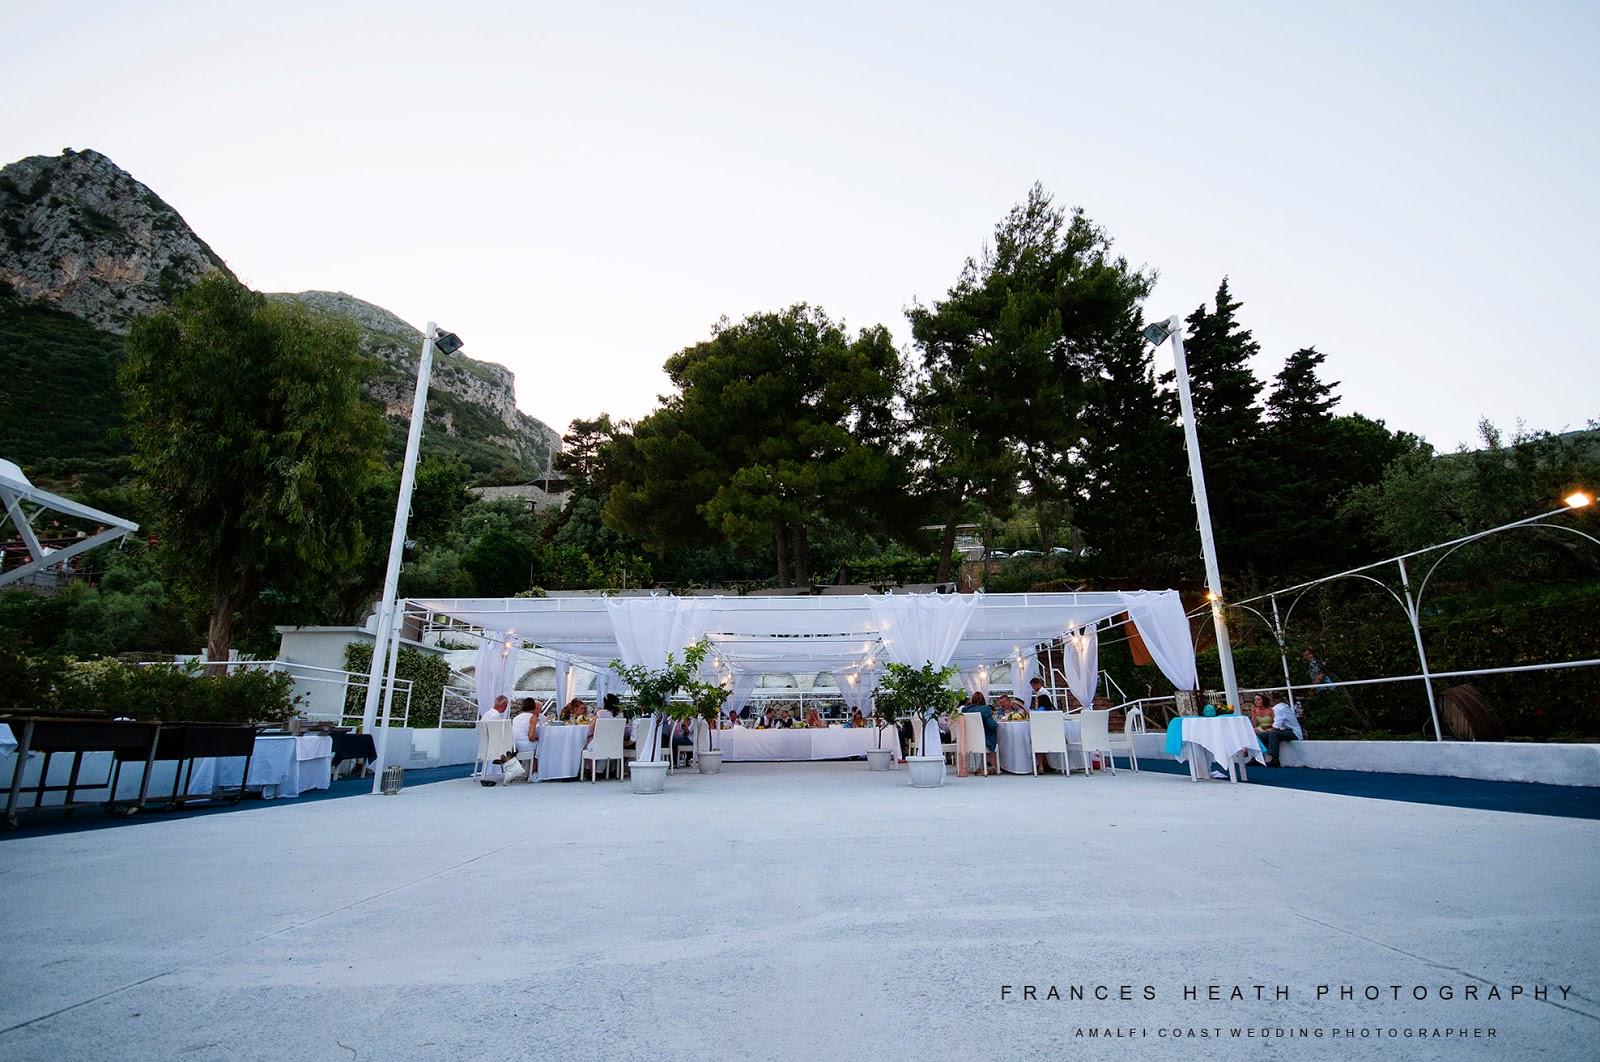 Wedding at the Sassi Beach Club in Nerano